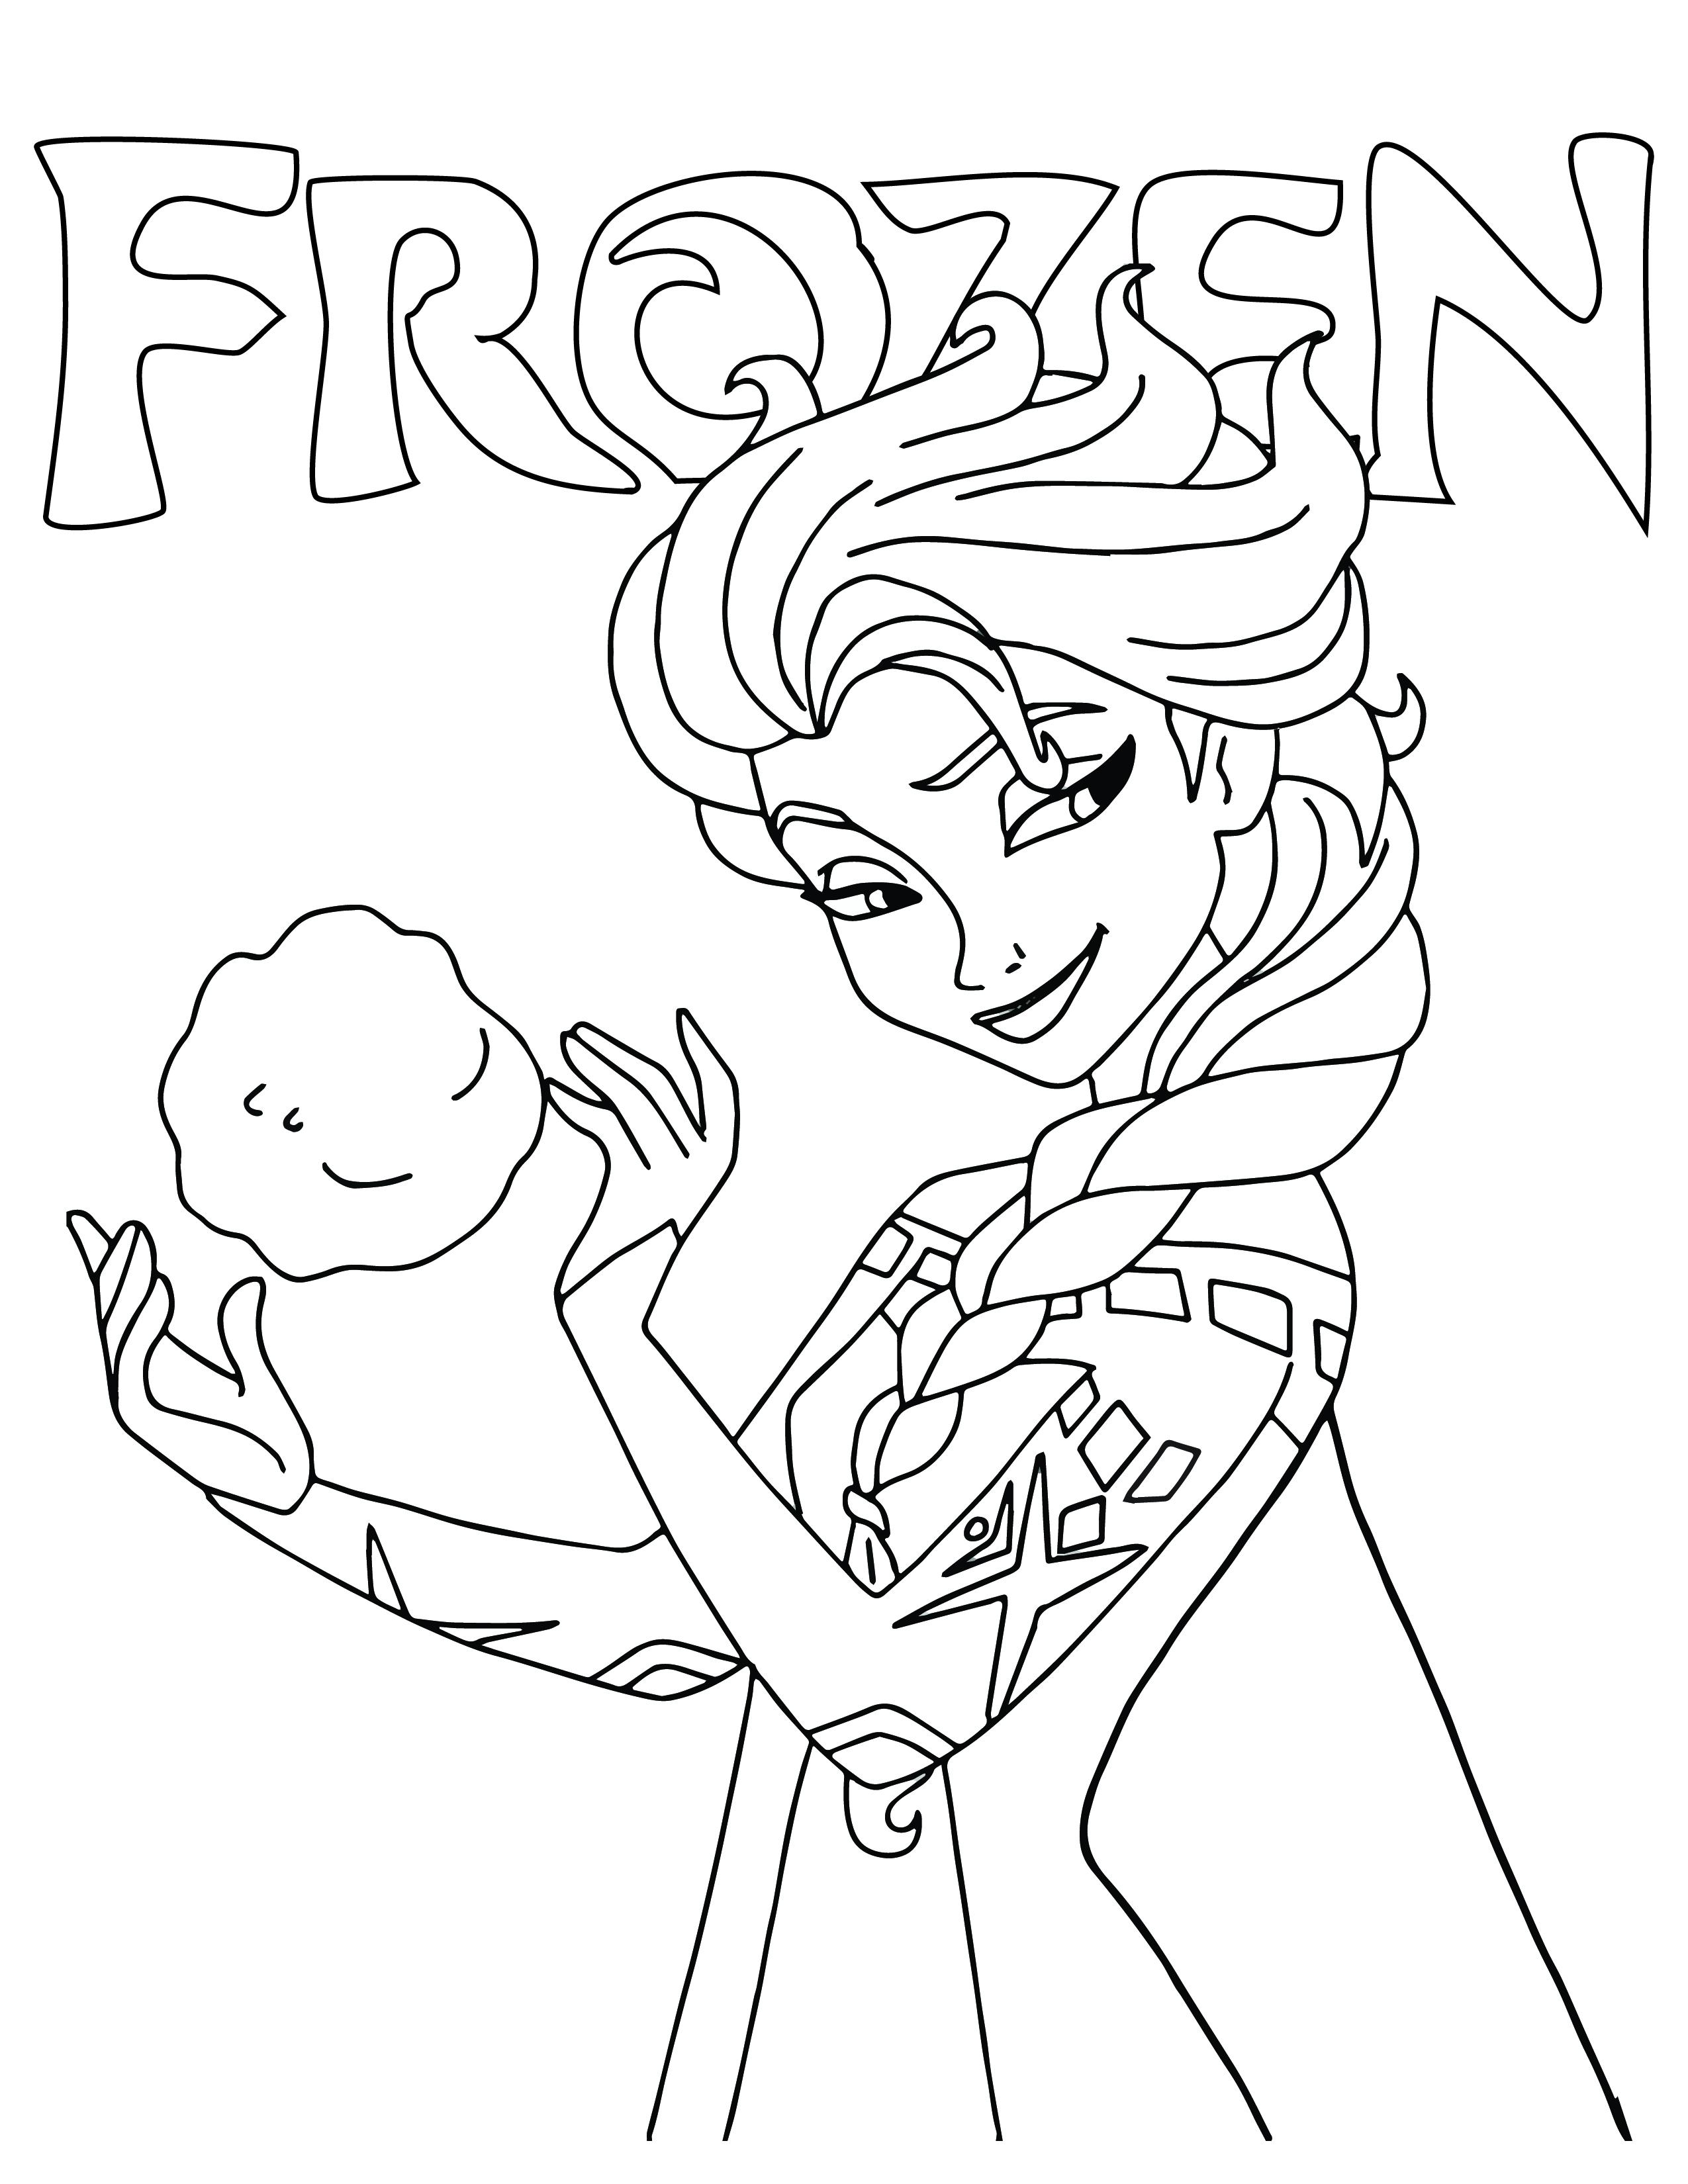 Princesse Elsa disney frozen dessin à imprimer - Artherapie.ca